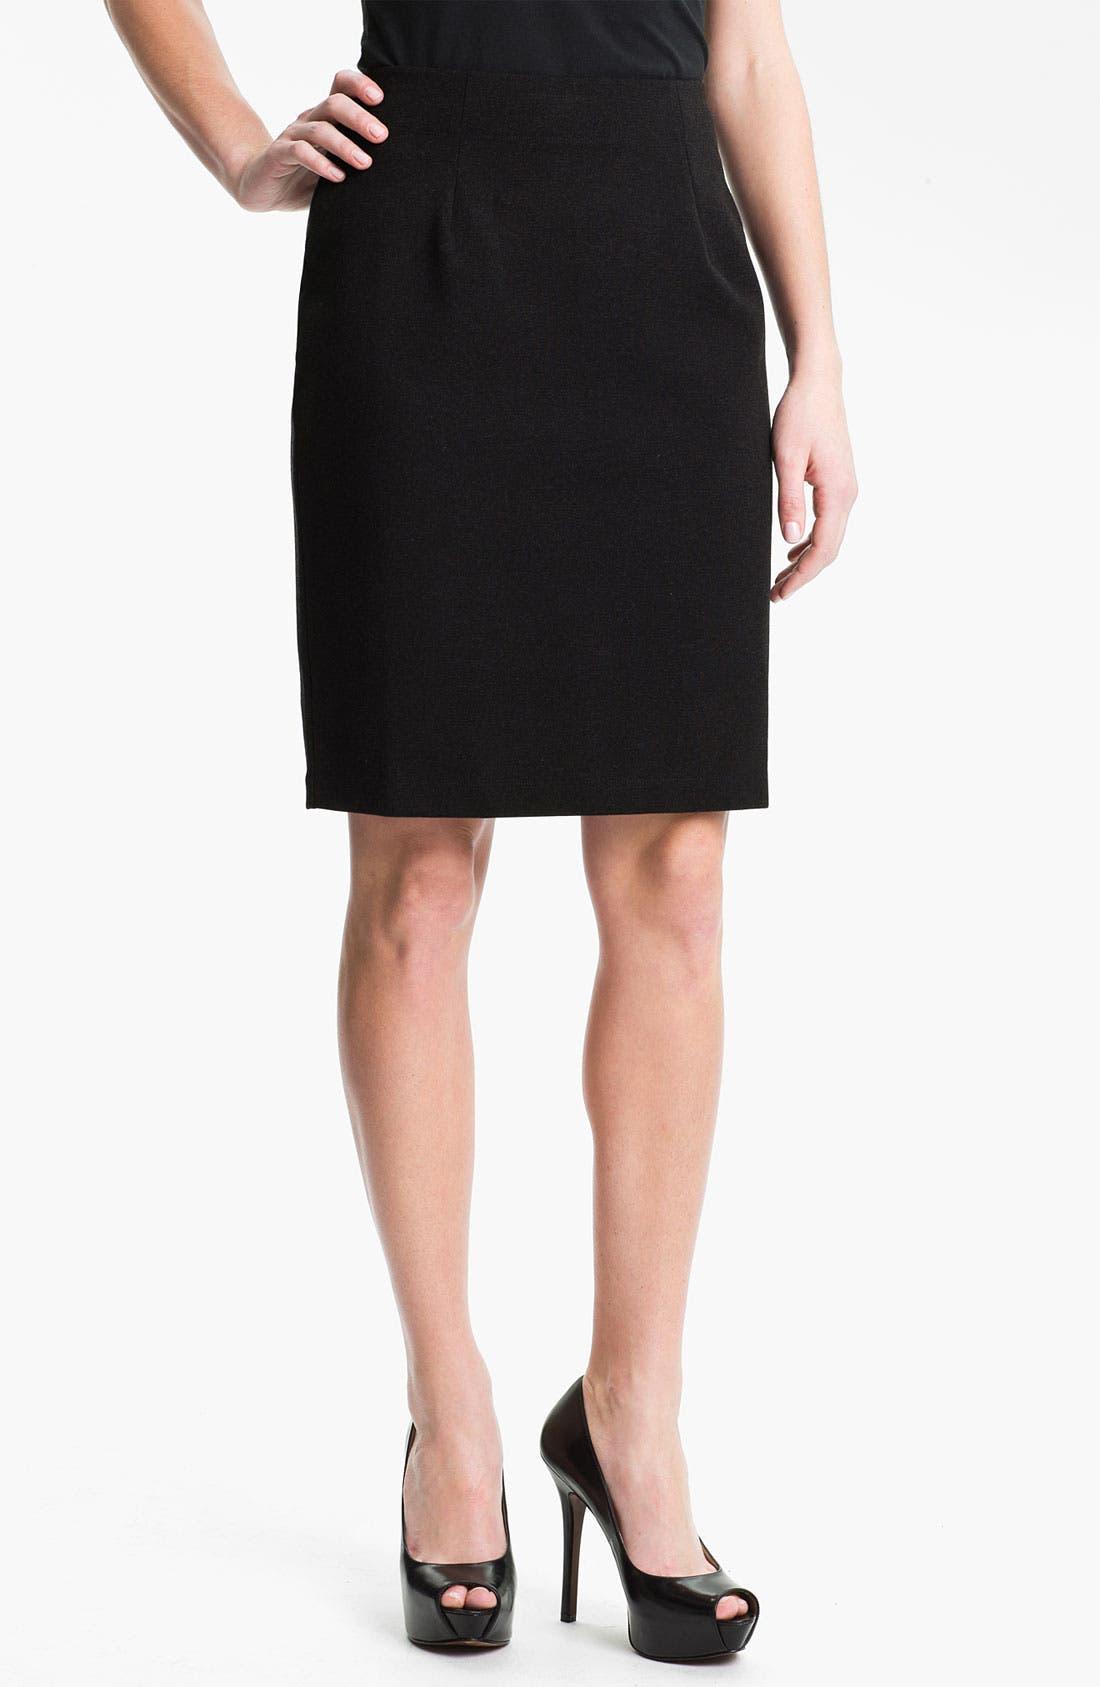 Alternate Image 1 Selected - Eileen Fisher Ponte Skirt (Petite)